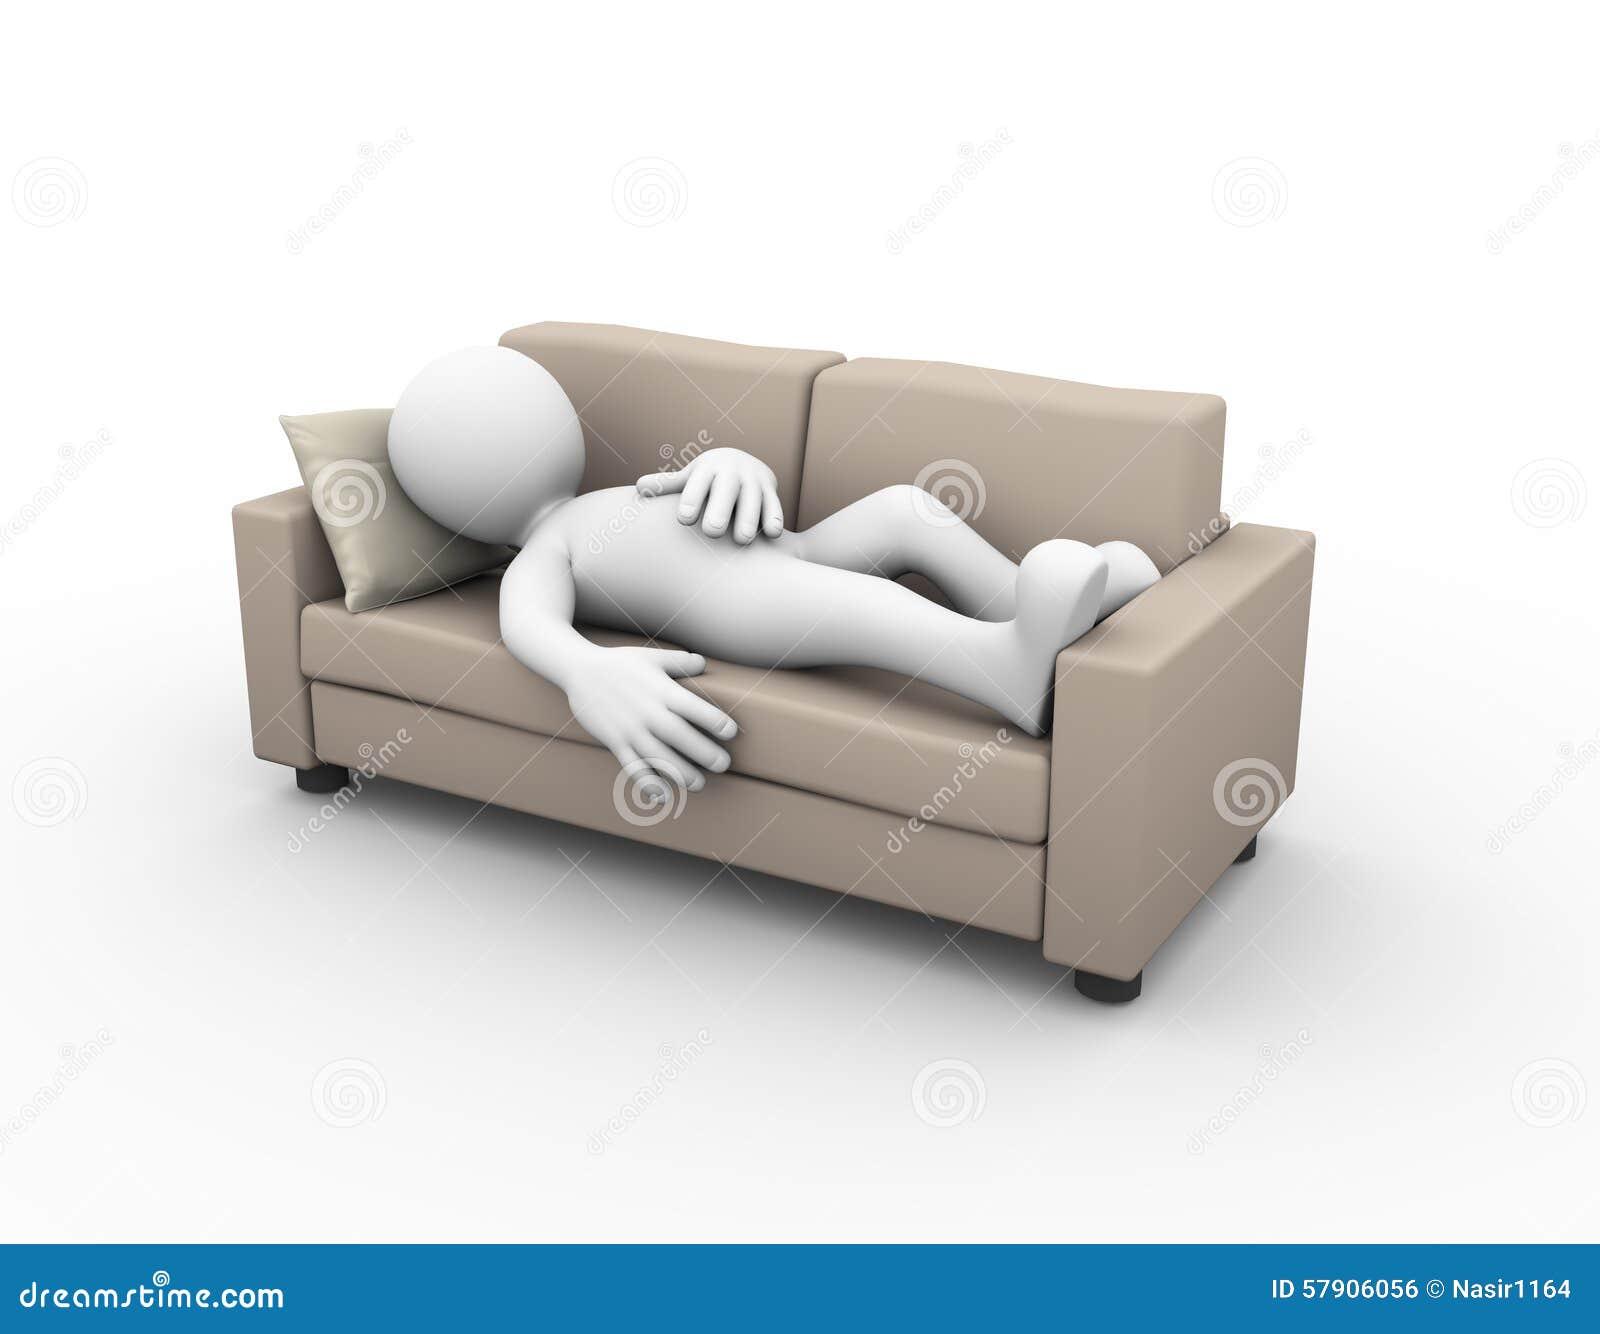 sleeping on a sofa permanently. Black Bedroom Furniture Sets. Home Design Ideas